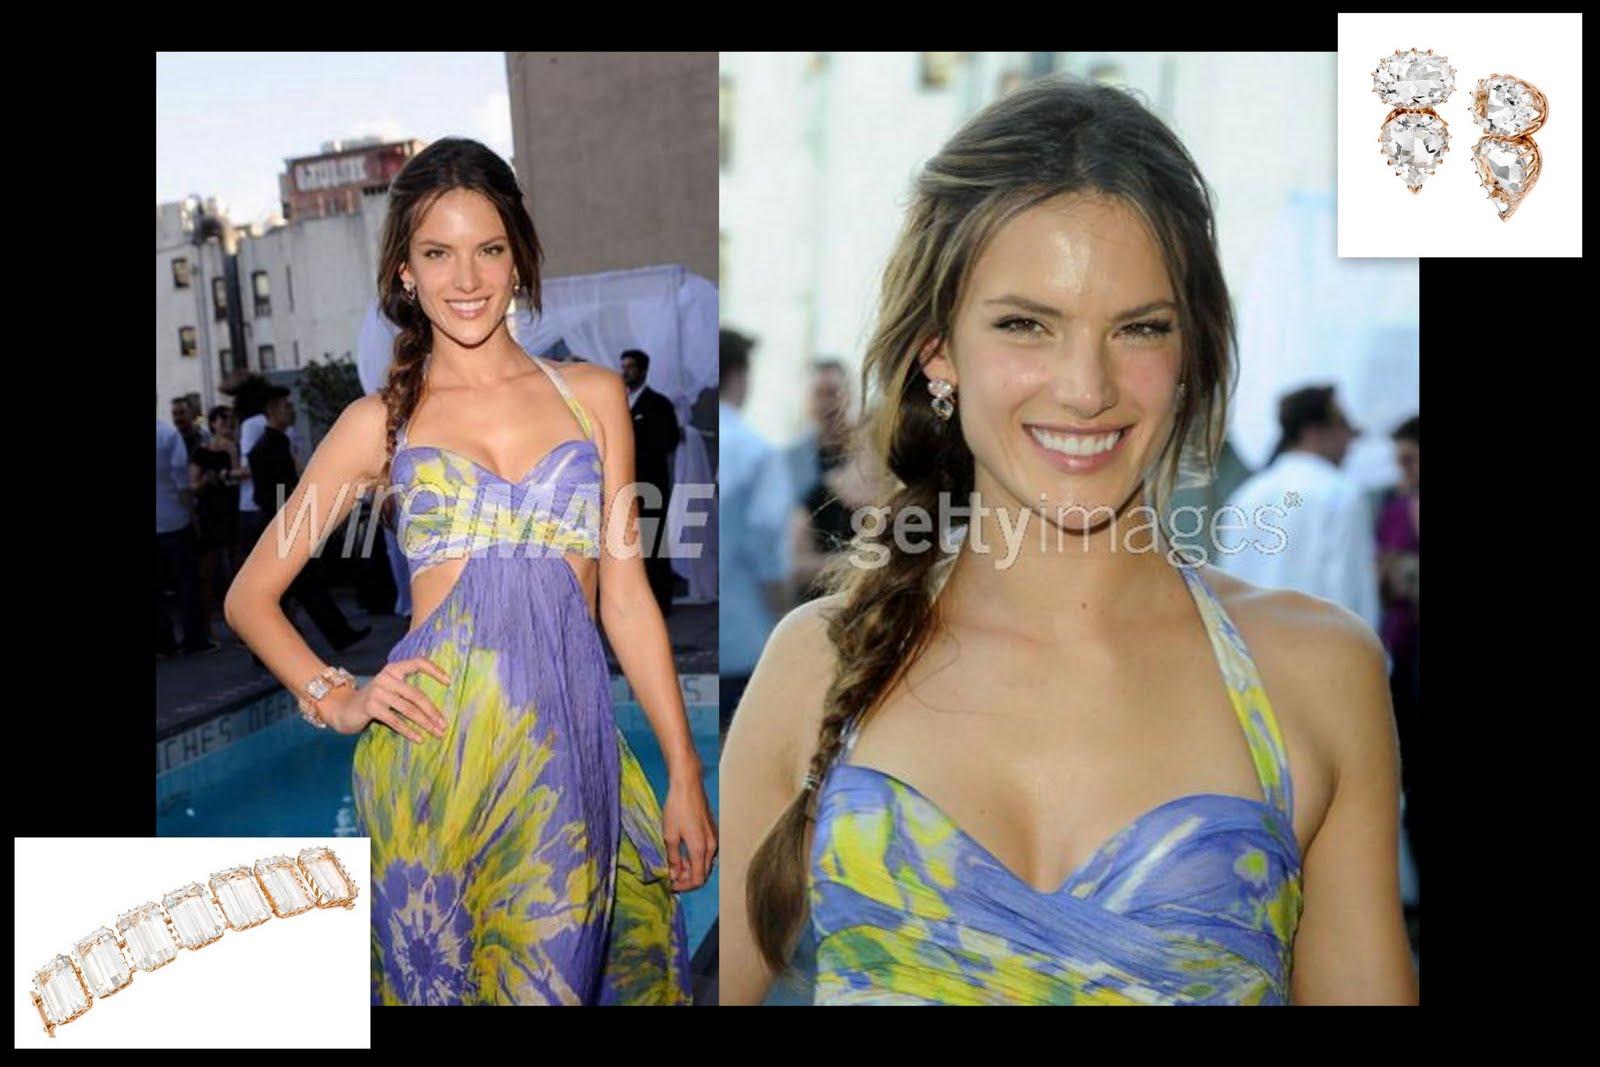 http://4.bp.blogspot.com/_p05ajdsJPw0/TDtp3wyXE1I/AAAAAAAABT4/rhnleGFF1d0/s1600/Alessandra+Ambrosia.jpg